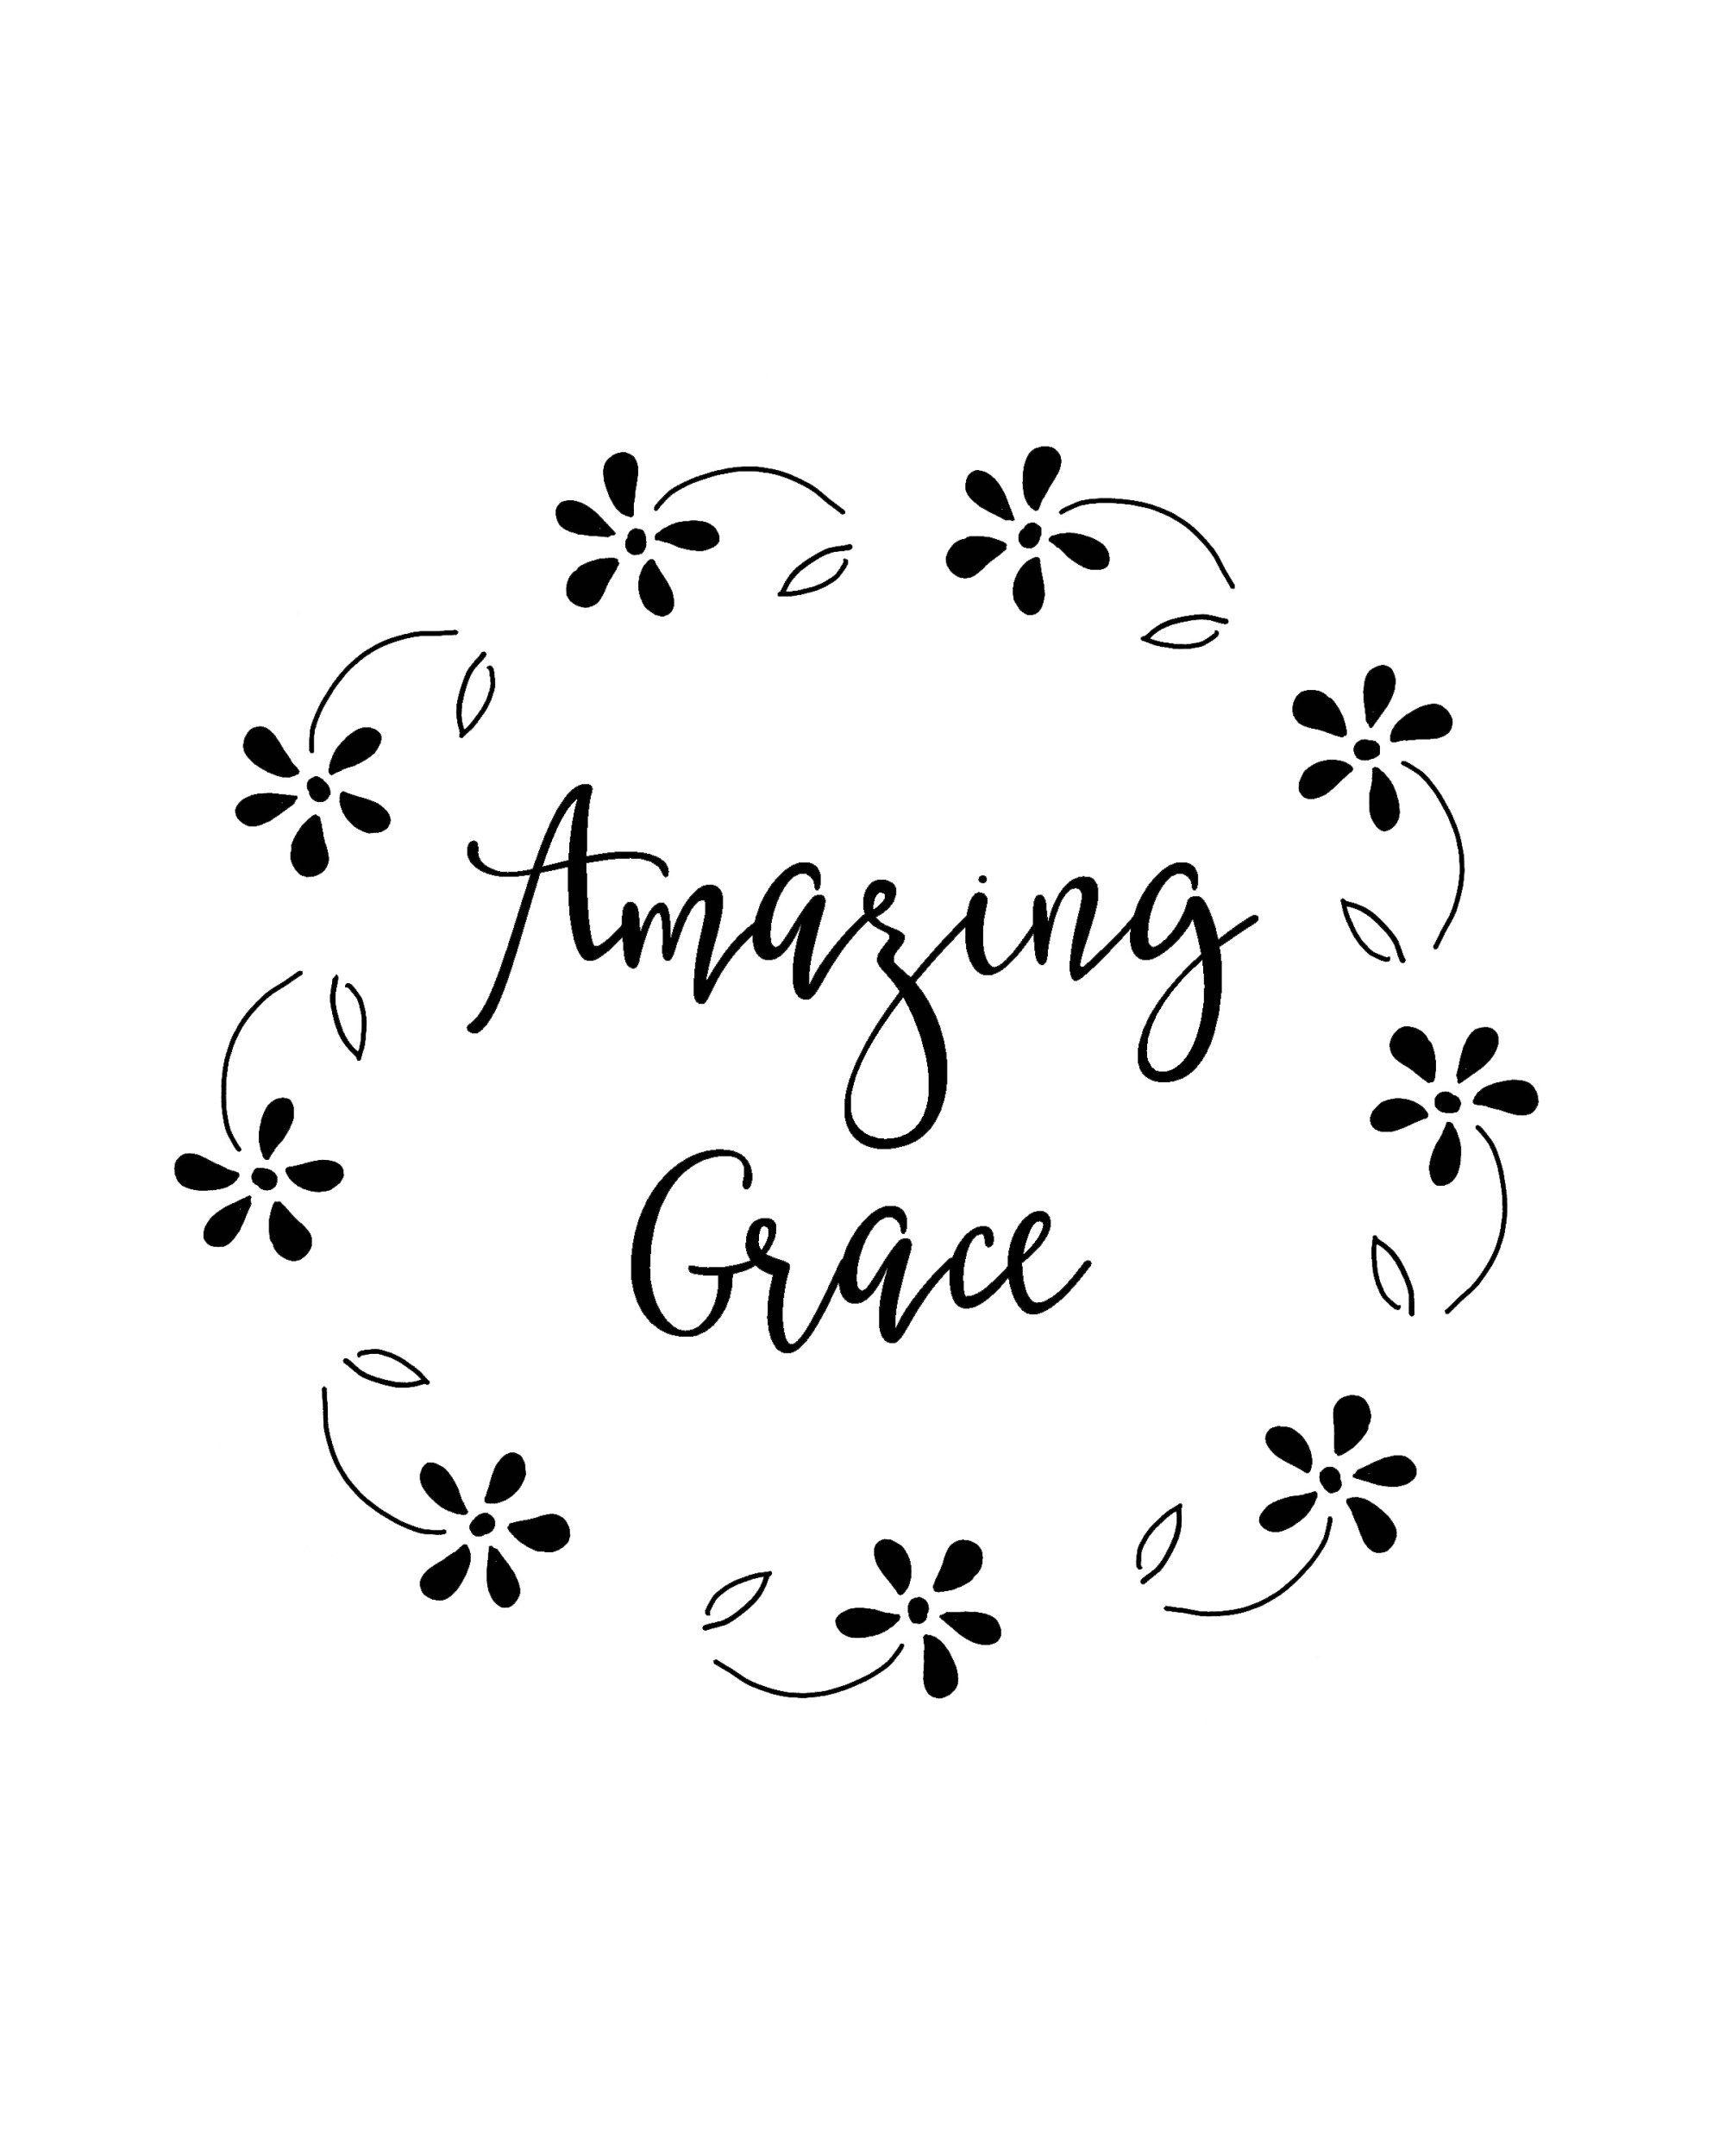 Amazing Grace Hymn Free Printables.